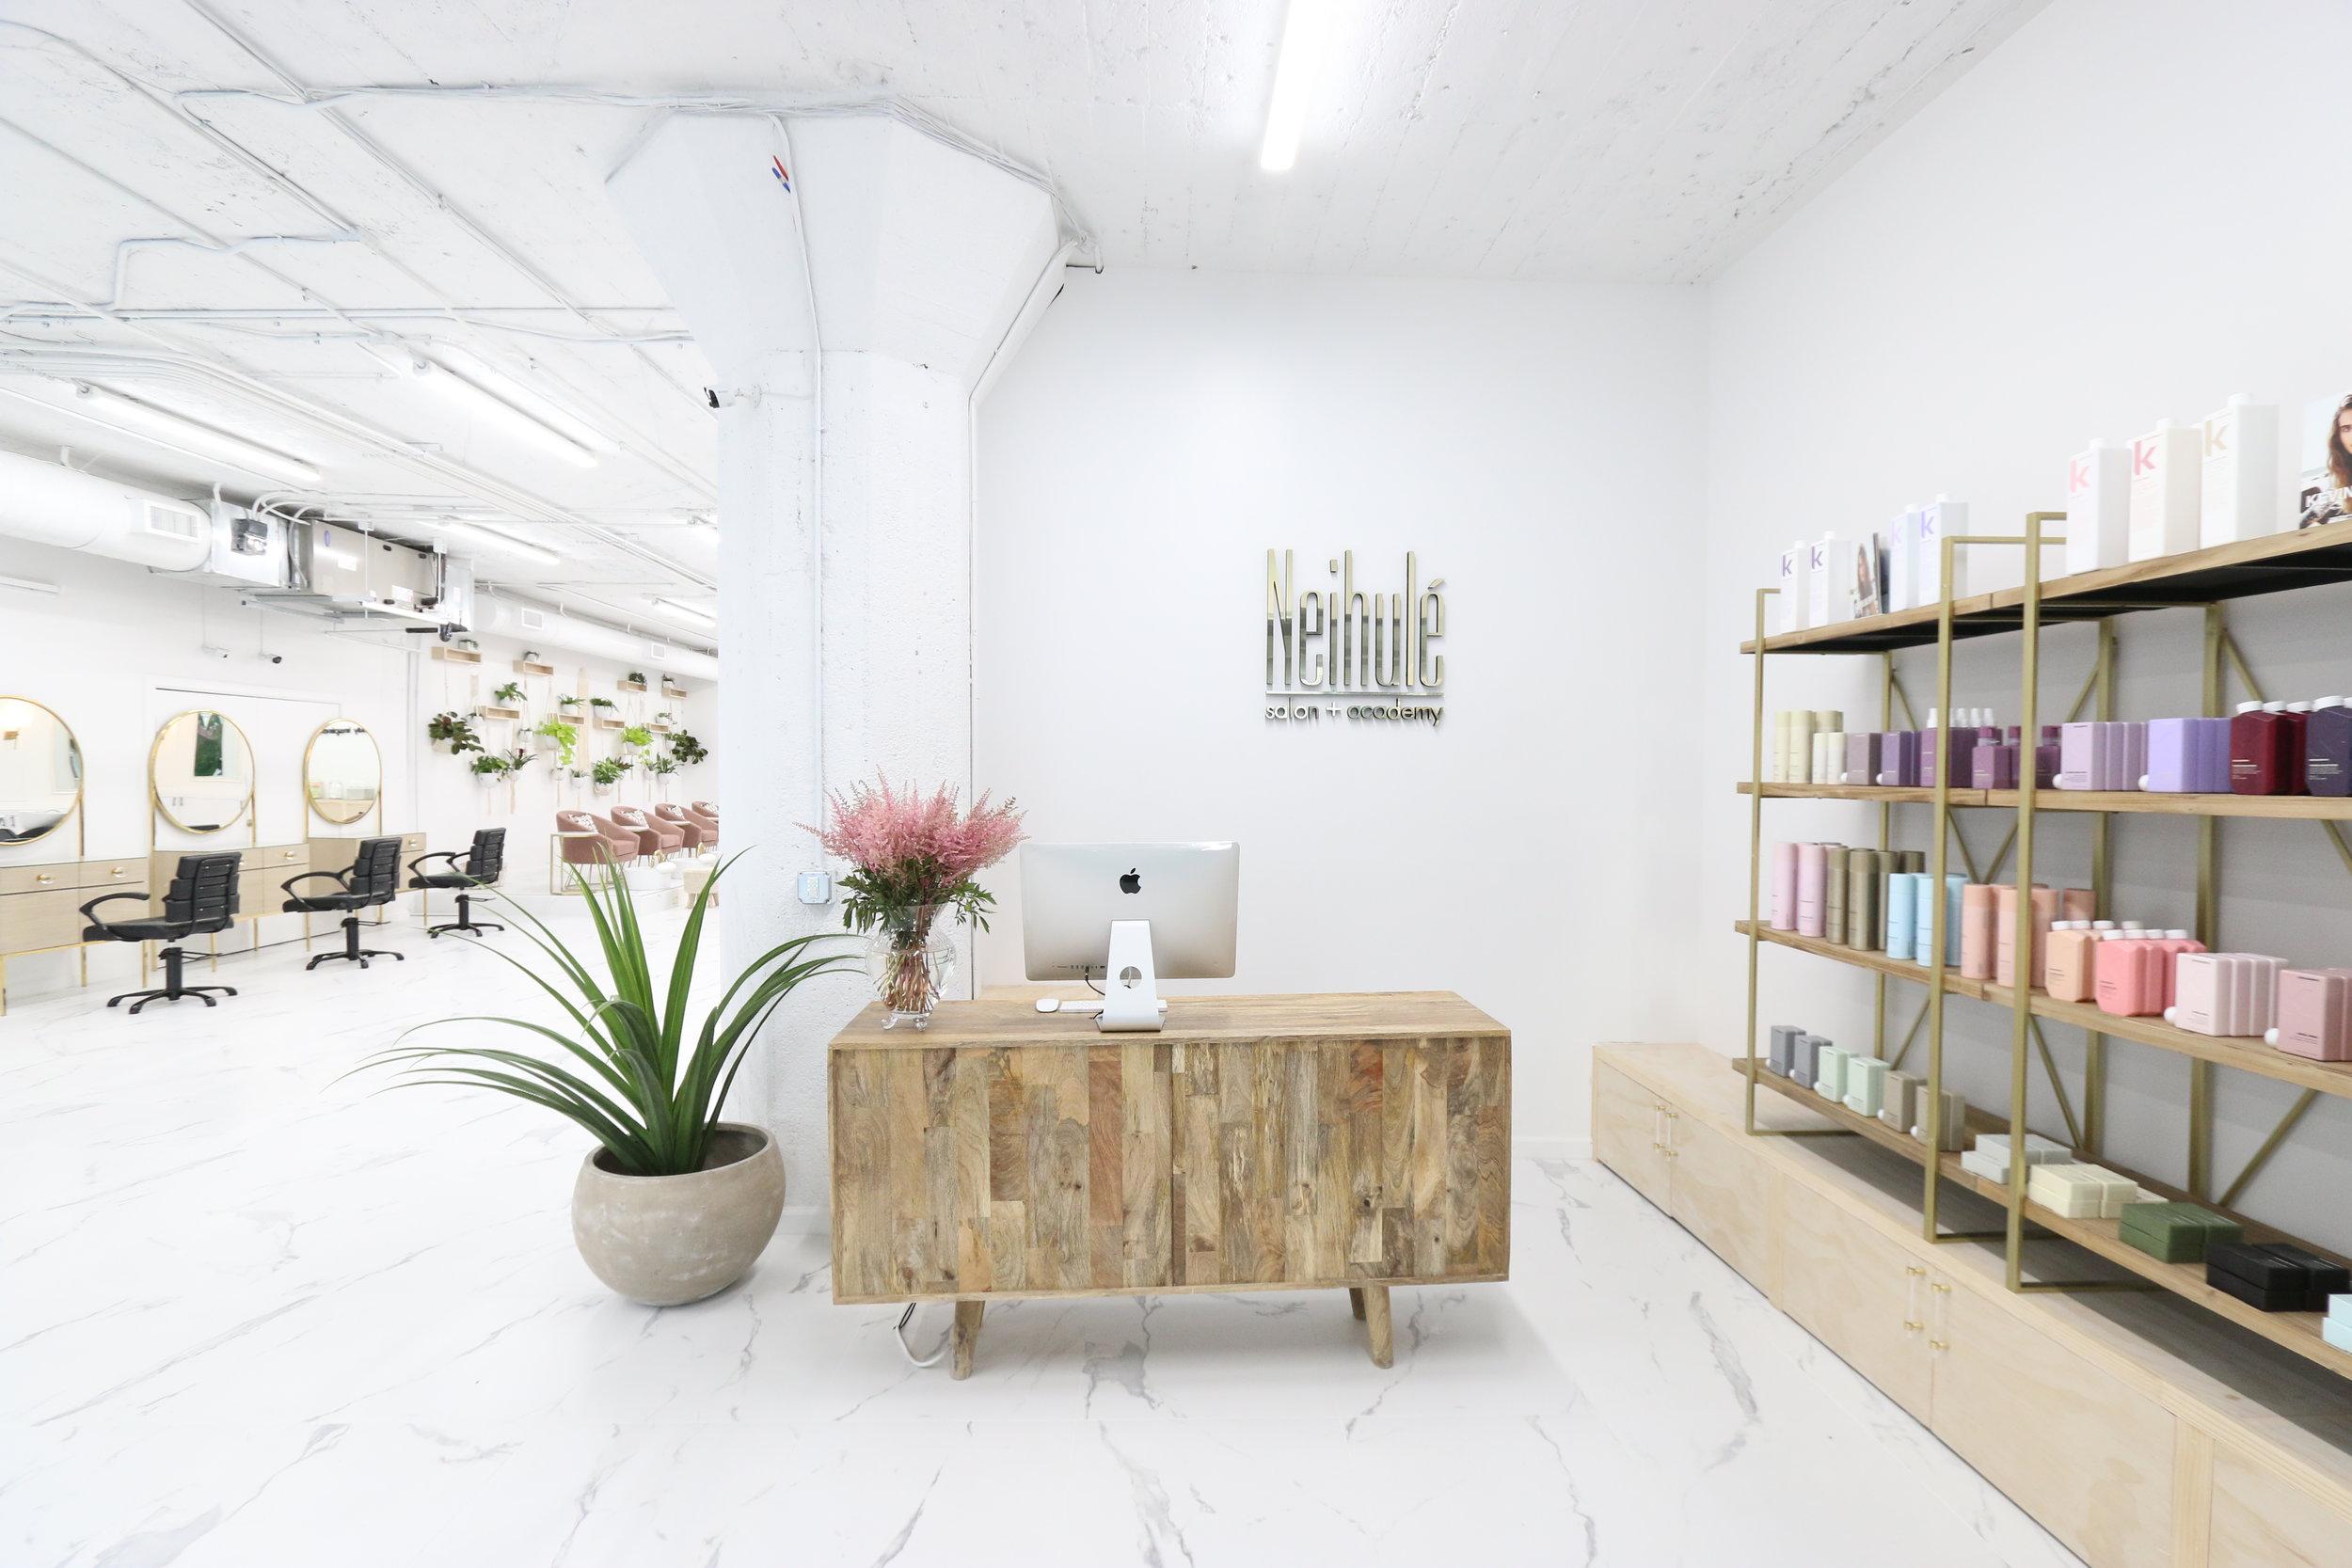 Neihule Salon+Academy -